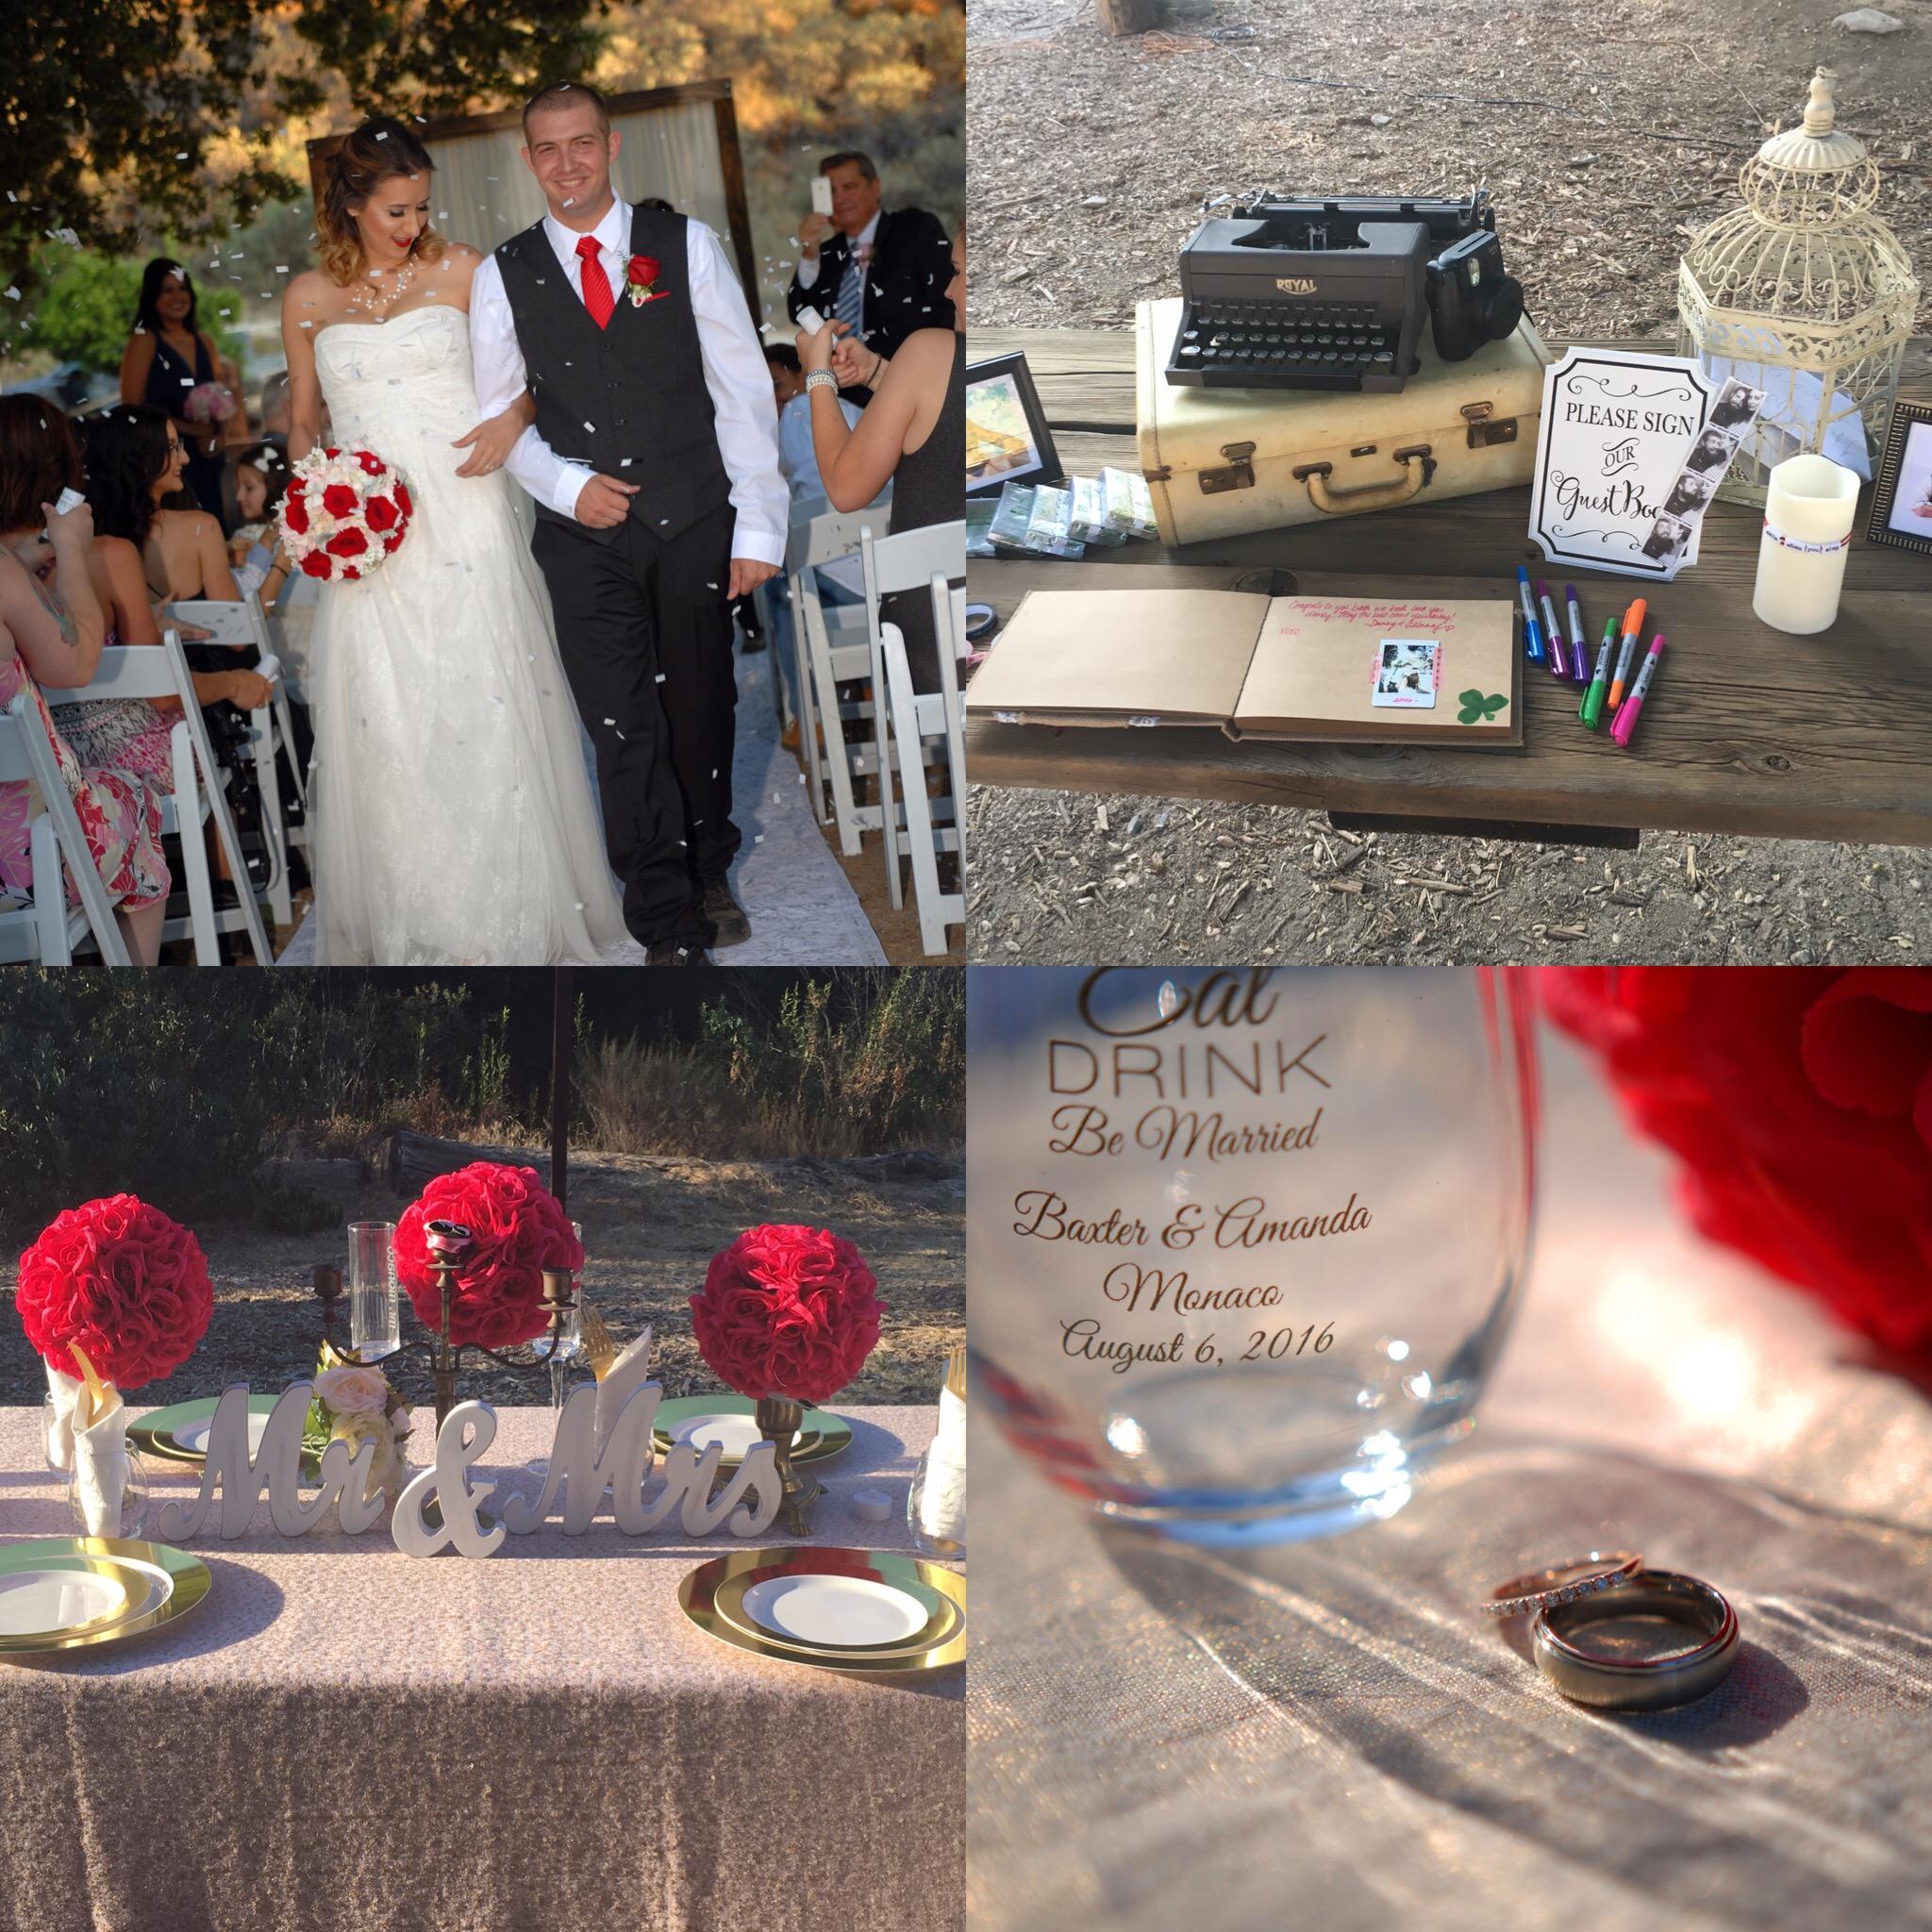 DIY Rustic Glam Wedding at Reptacular Animals Ranch